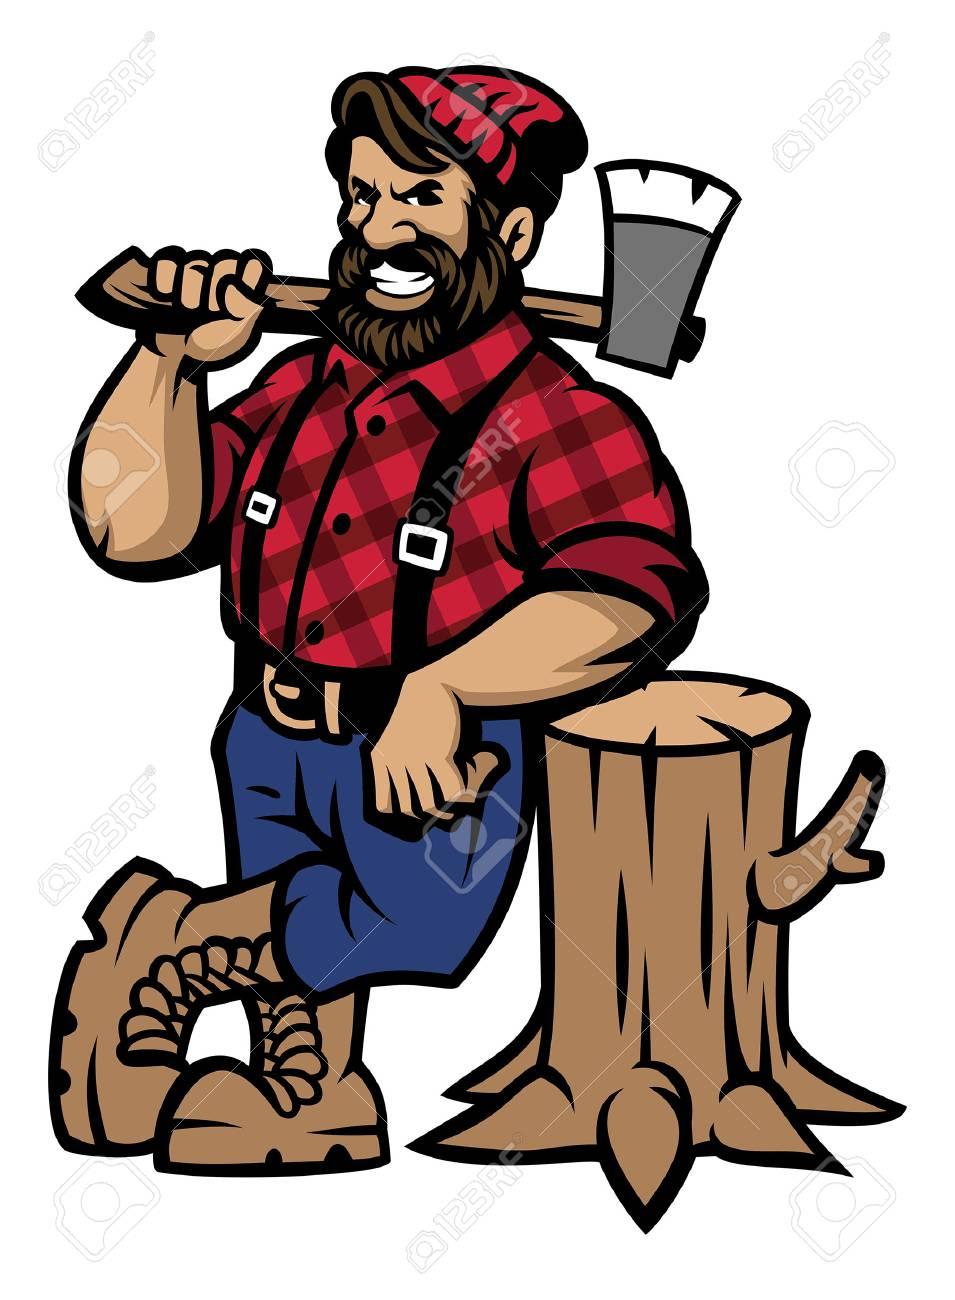 cartoon lumberjack mascot lean on the log wood - 121632004